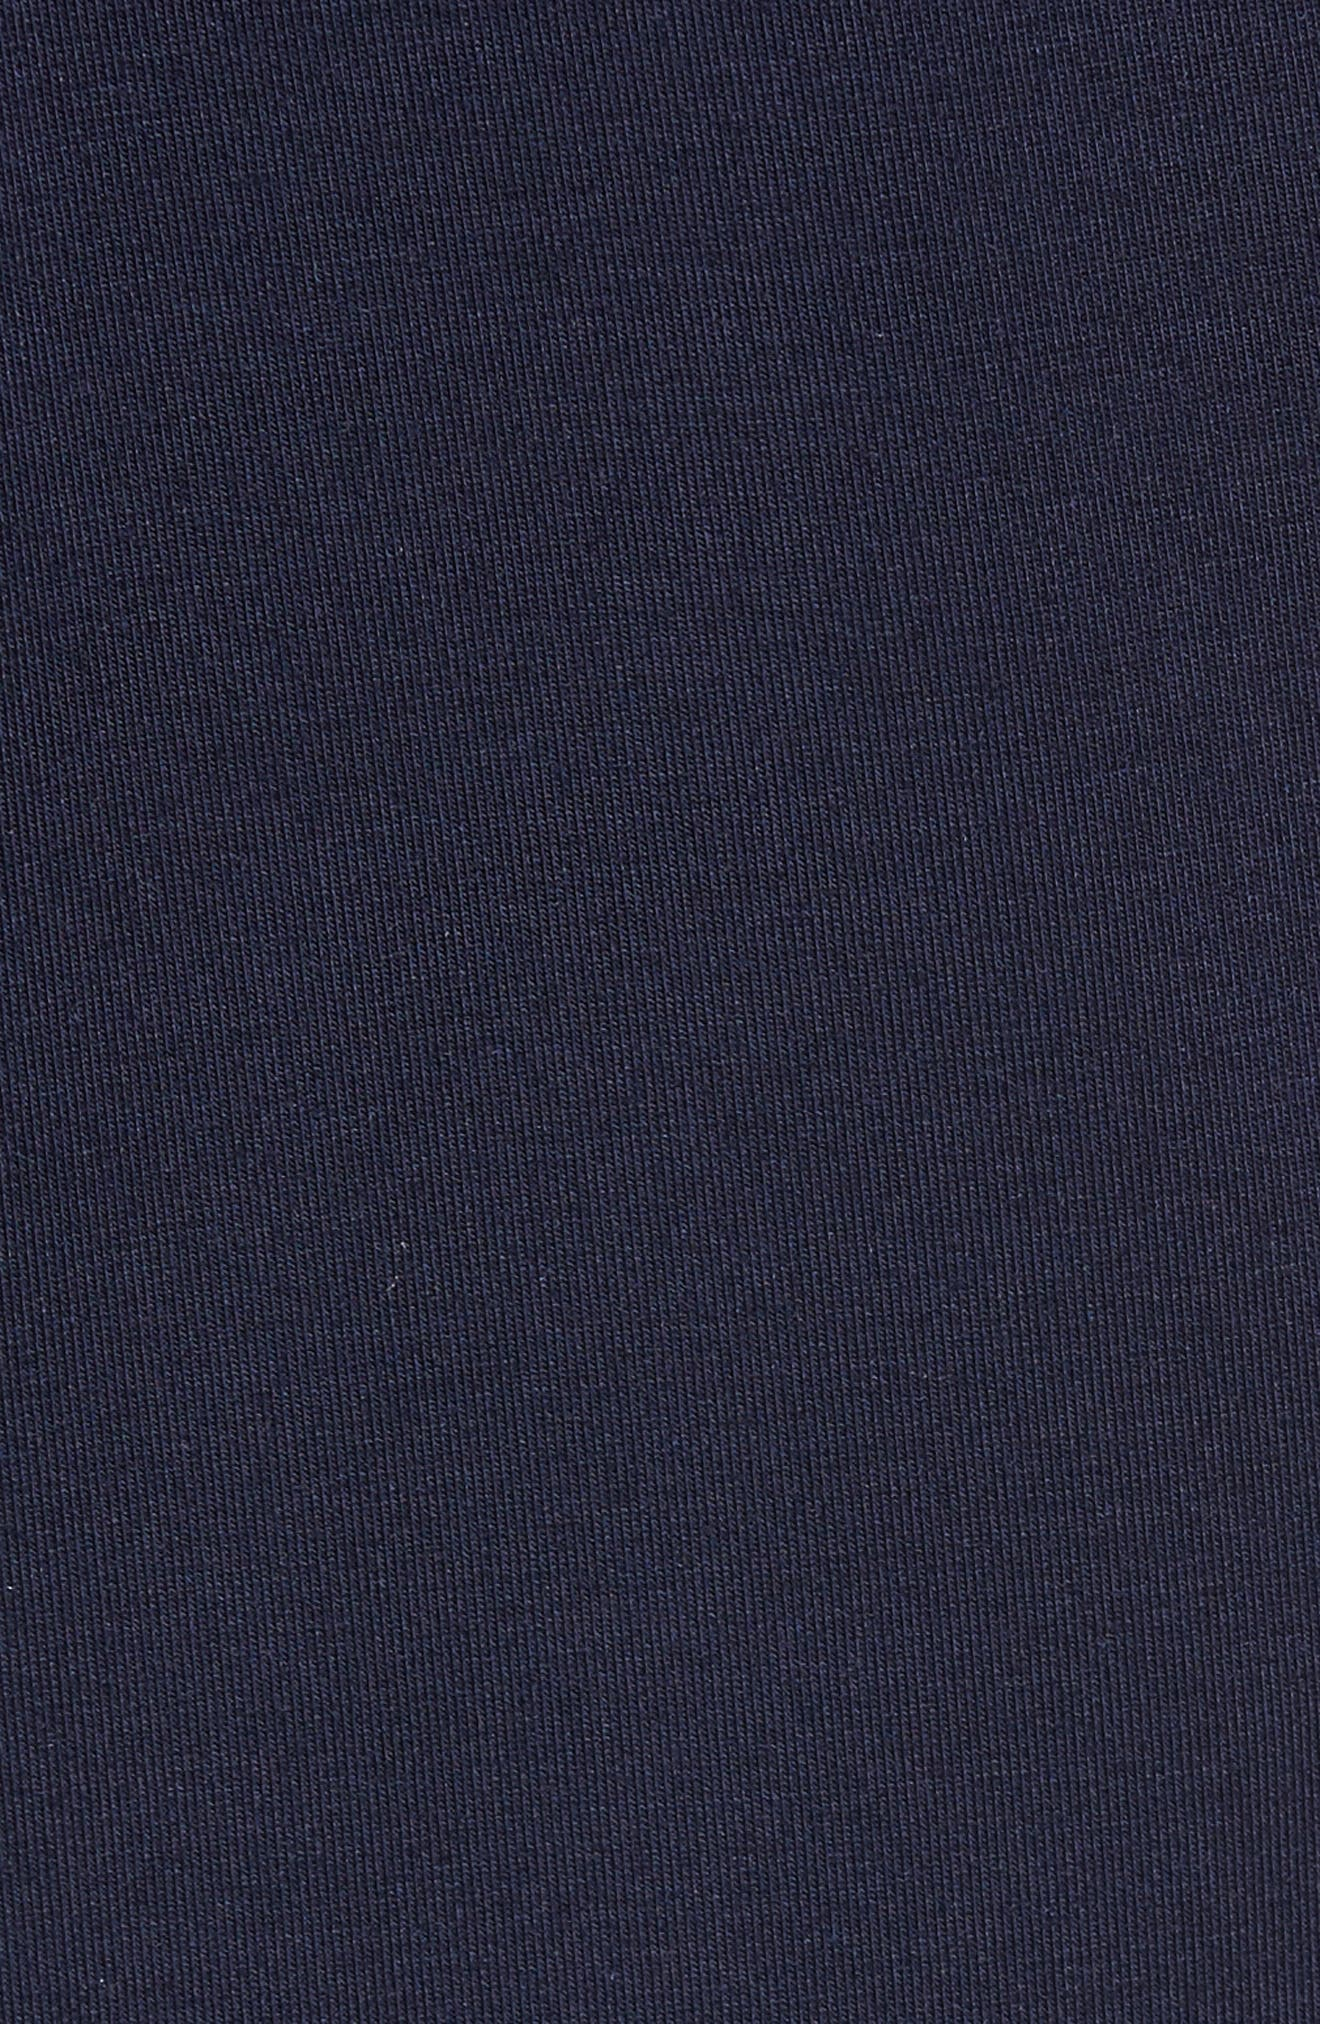 Modal & Silk Lounge Pants,                             Alternate thumbnail 5, color,                             411